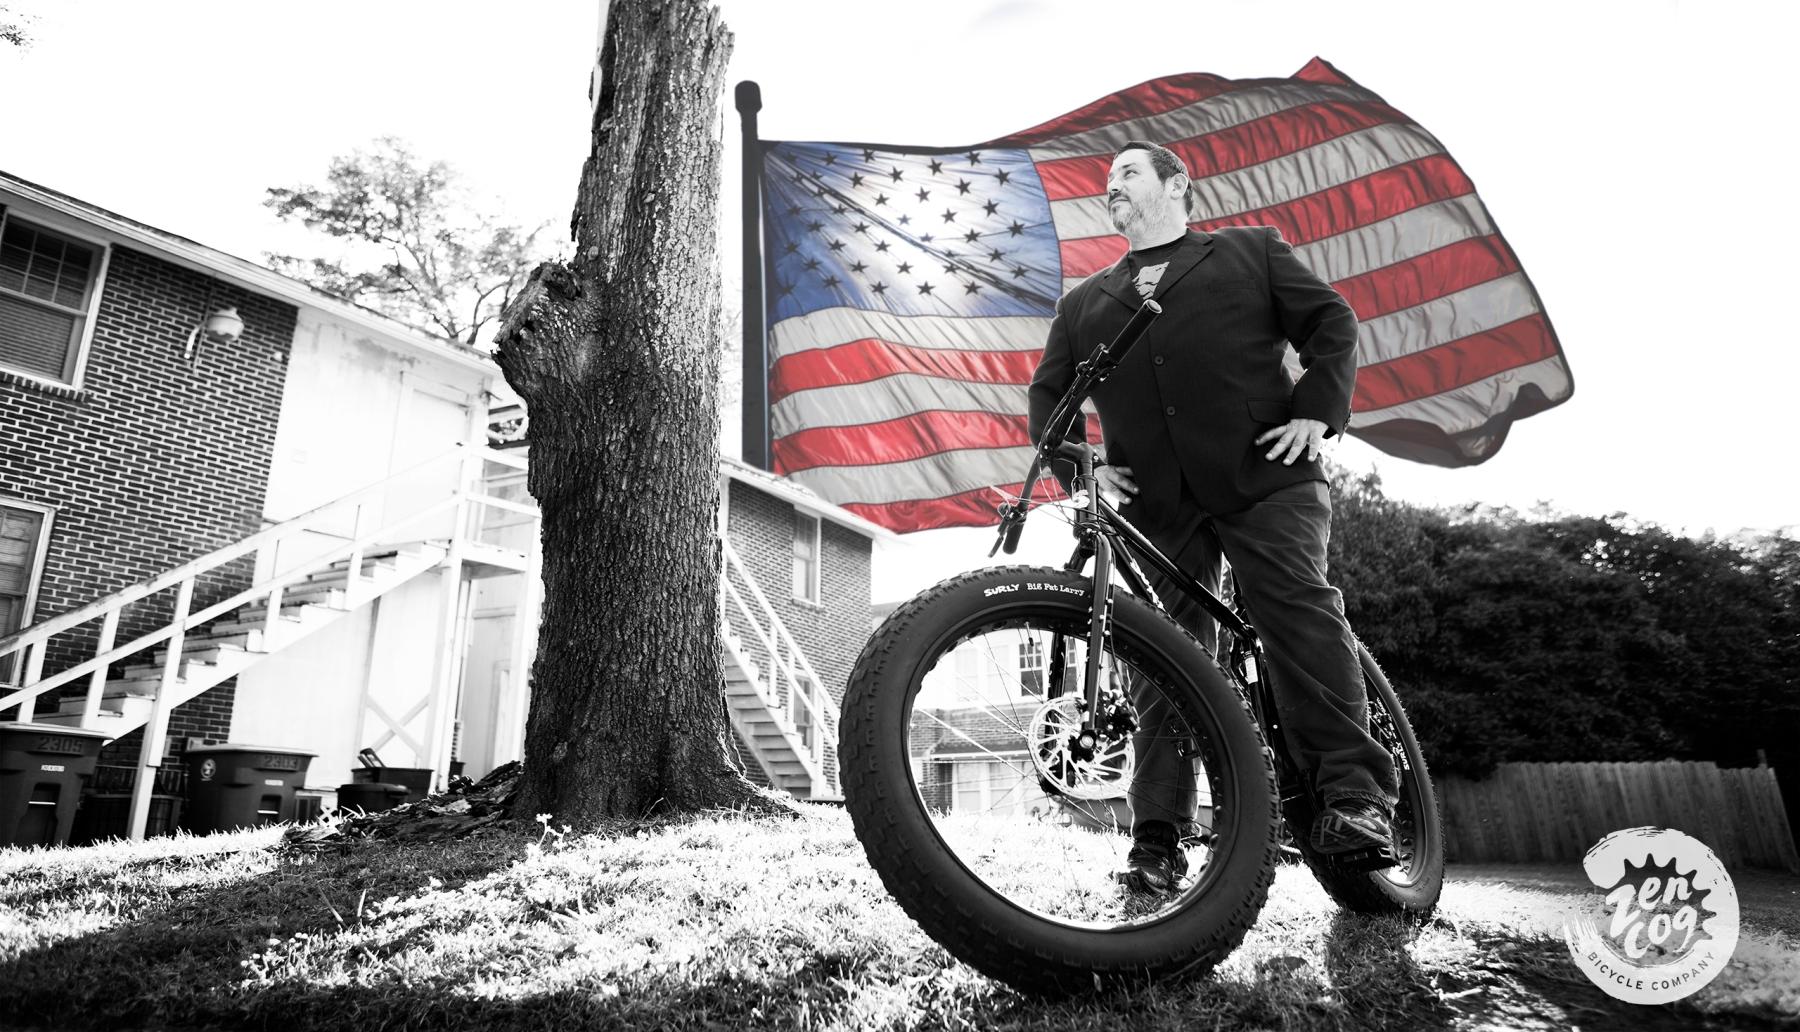 bike shop owner, cyclist, presidential, Garf Cooper, Surly, Surly Ice Cream Truck, Fat Bike